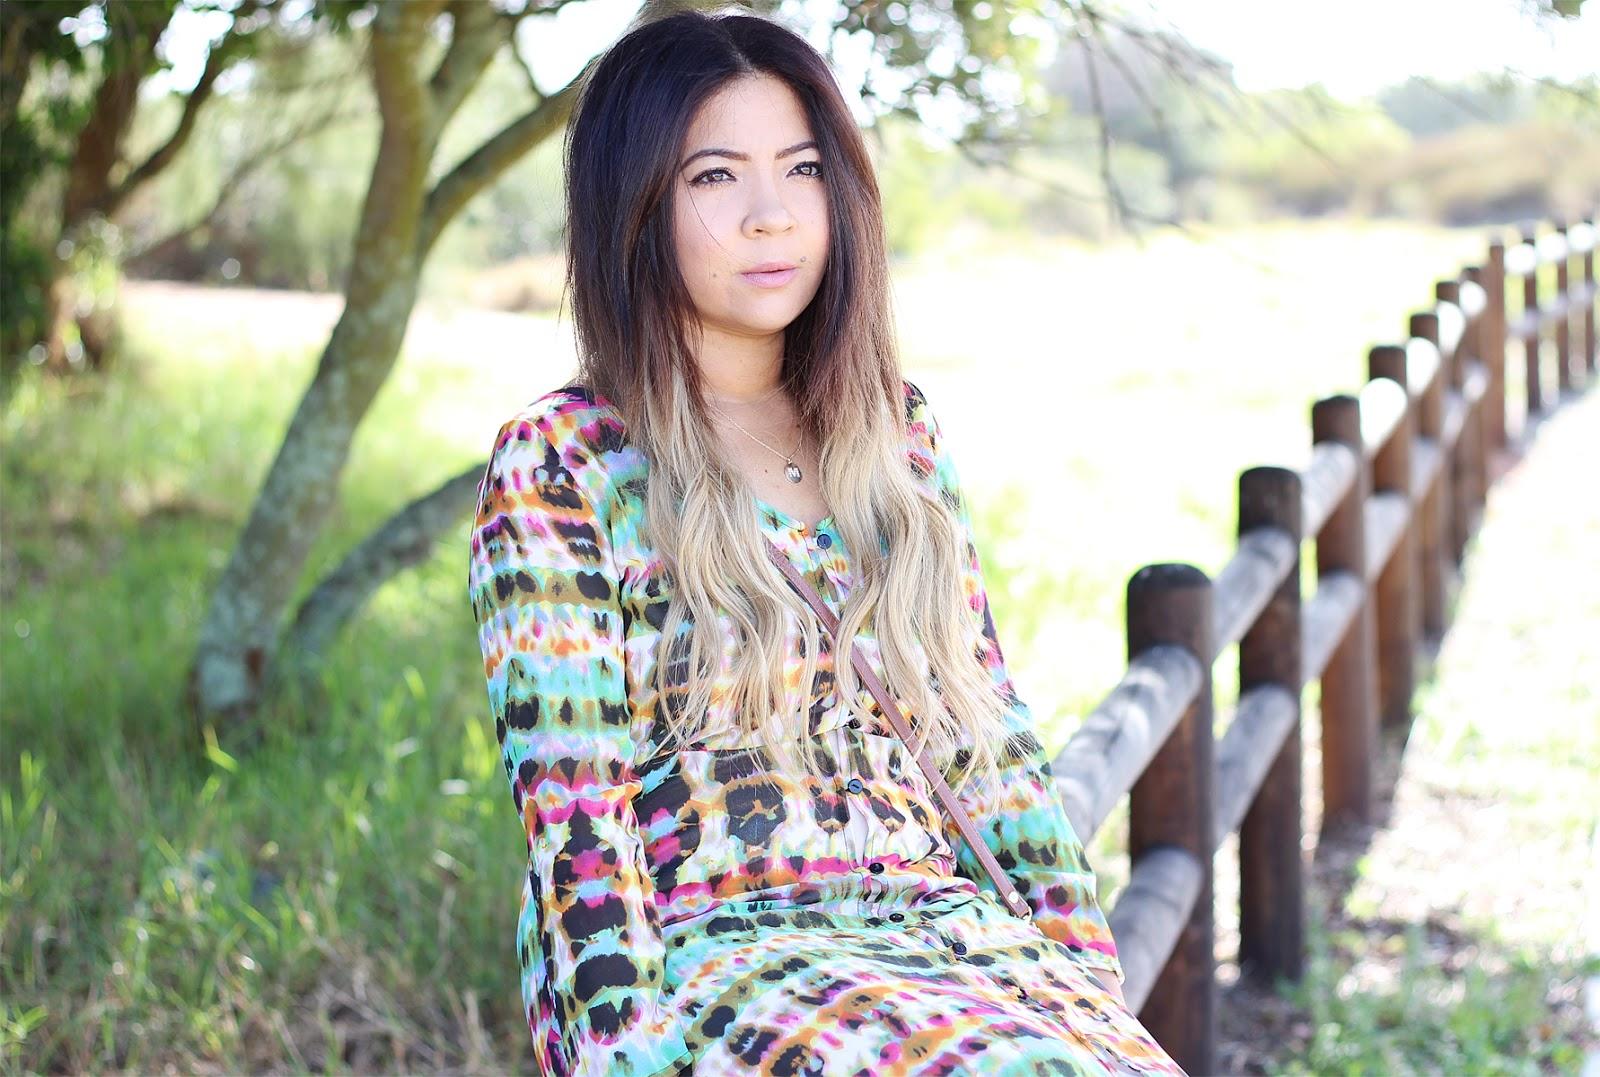 zara tie dye maxi dress, round reflective sunglasses, tie dye dress, button down maxi dress, modest fashion blogger, cape town fashion blogger